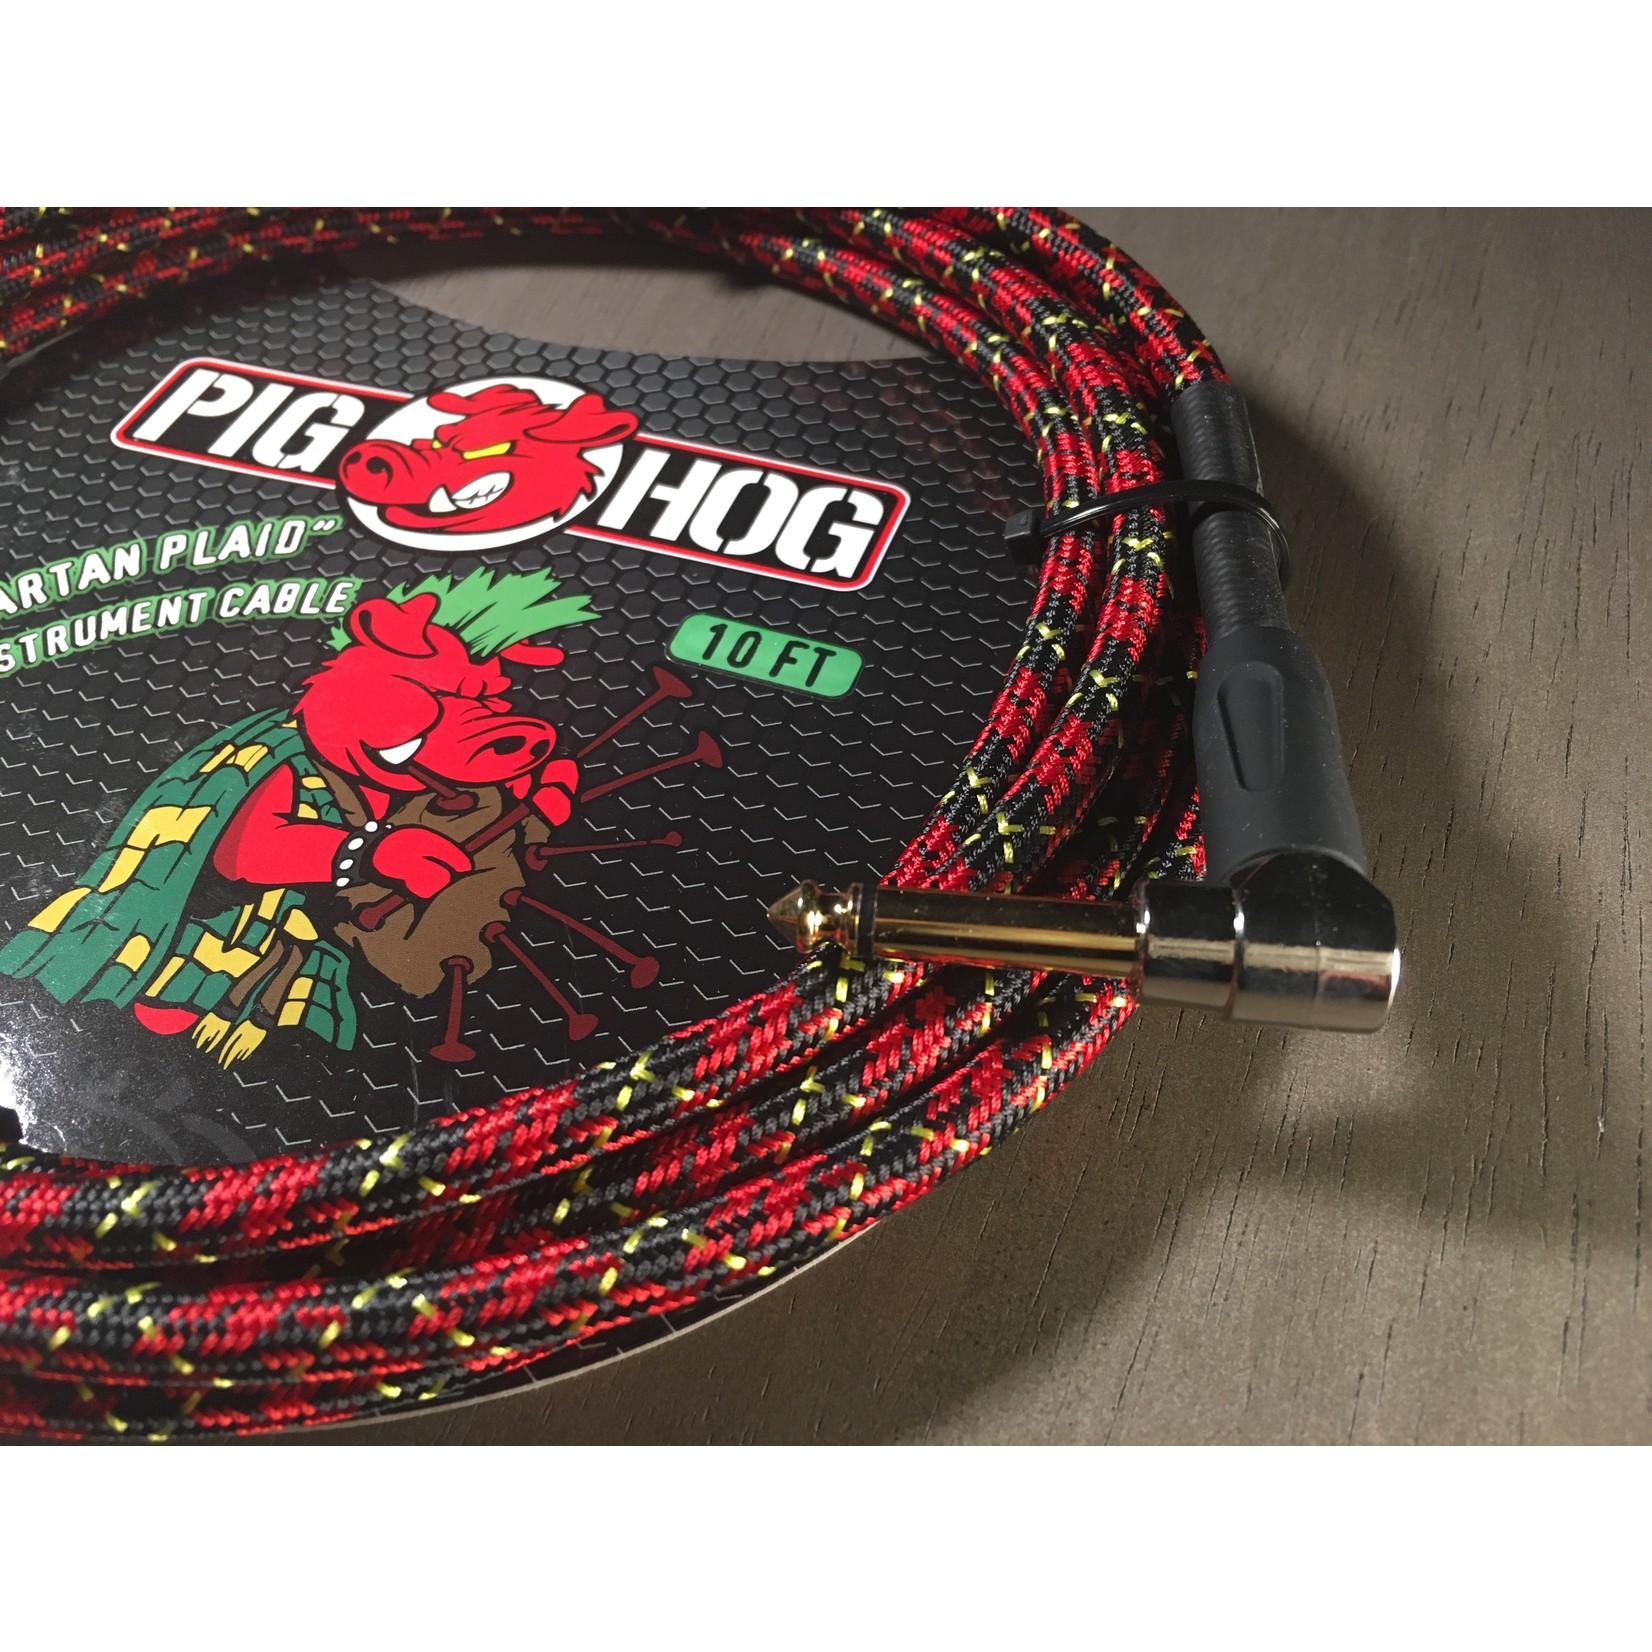 "Pig Hog Pig Hog ""Tartan Plaid"" Vintage Woven Instrument Cable - 10 FT Right Angle (PCH10PLR)"